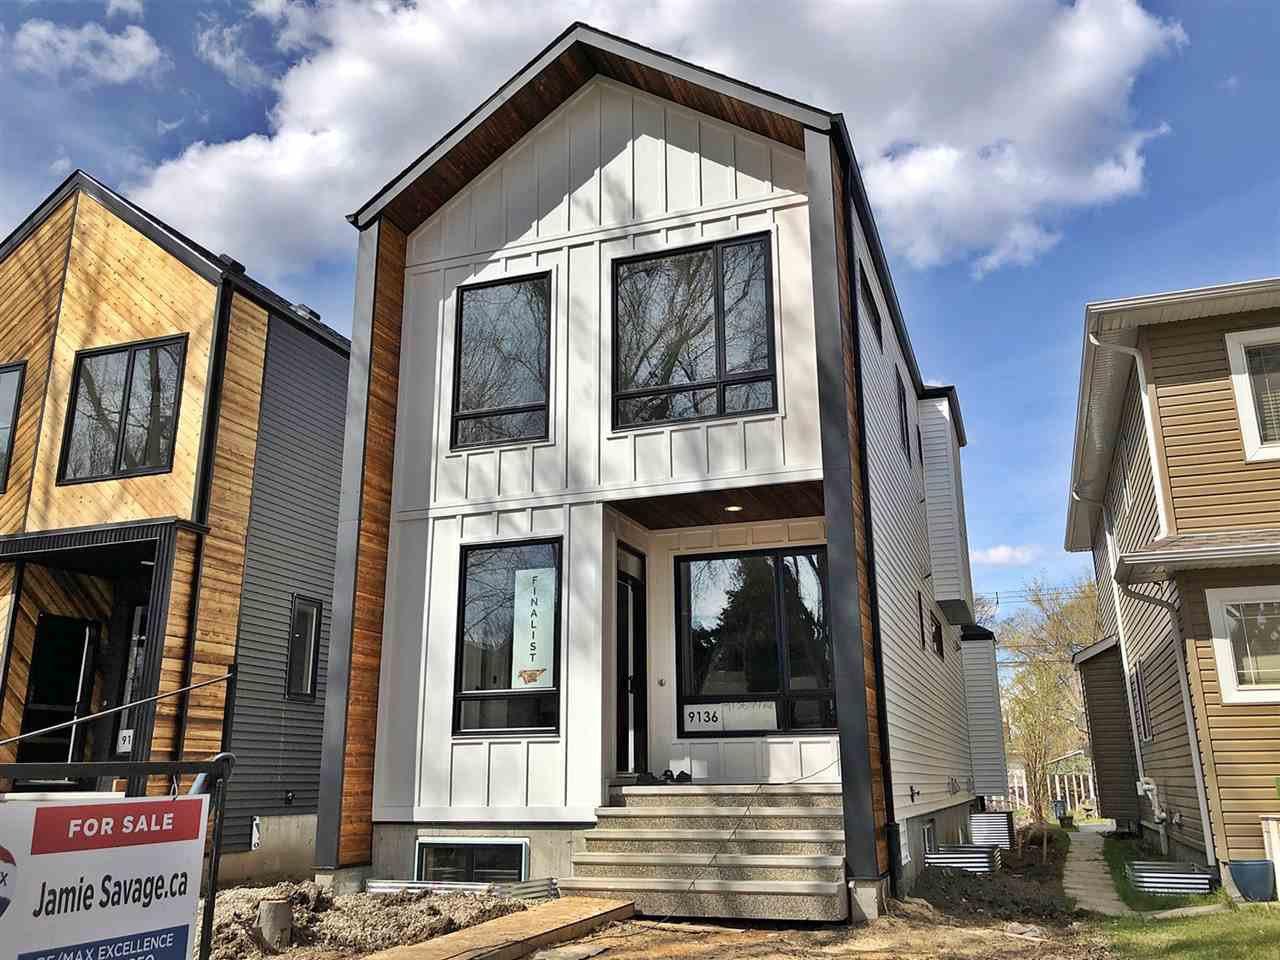 Main Photo: 9136 71 Avenue in Edmonton: Zone 17 House for sale : MLS®# E4192608